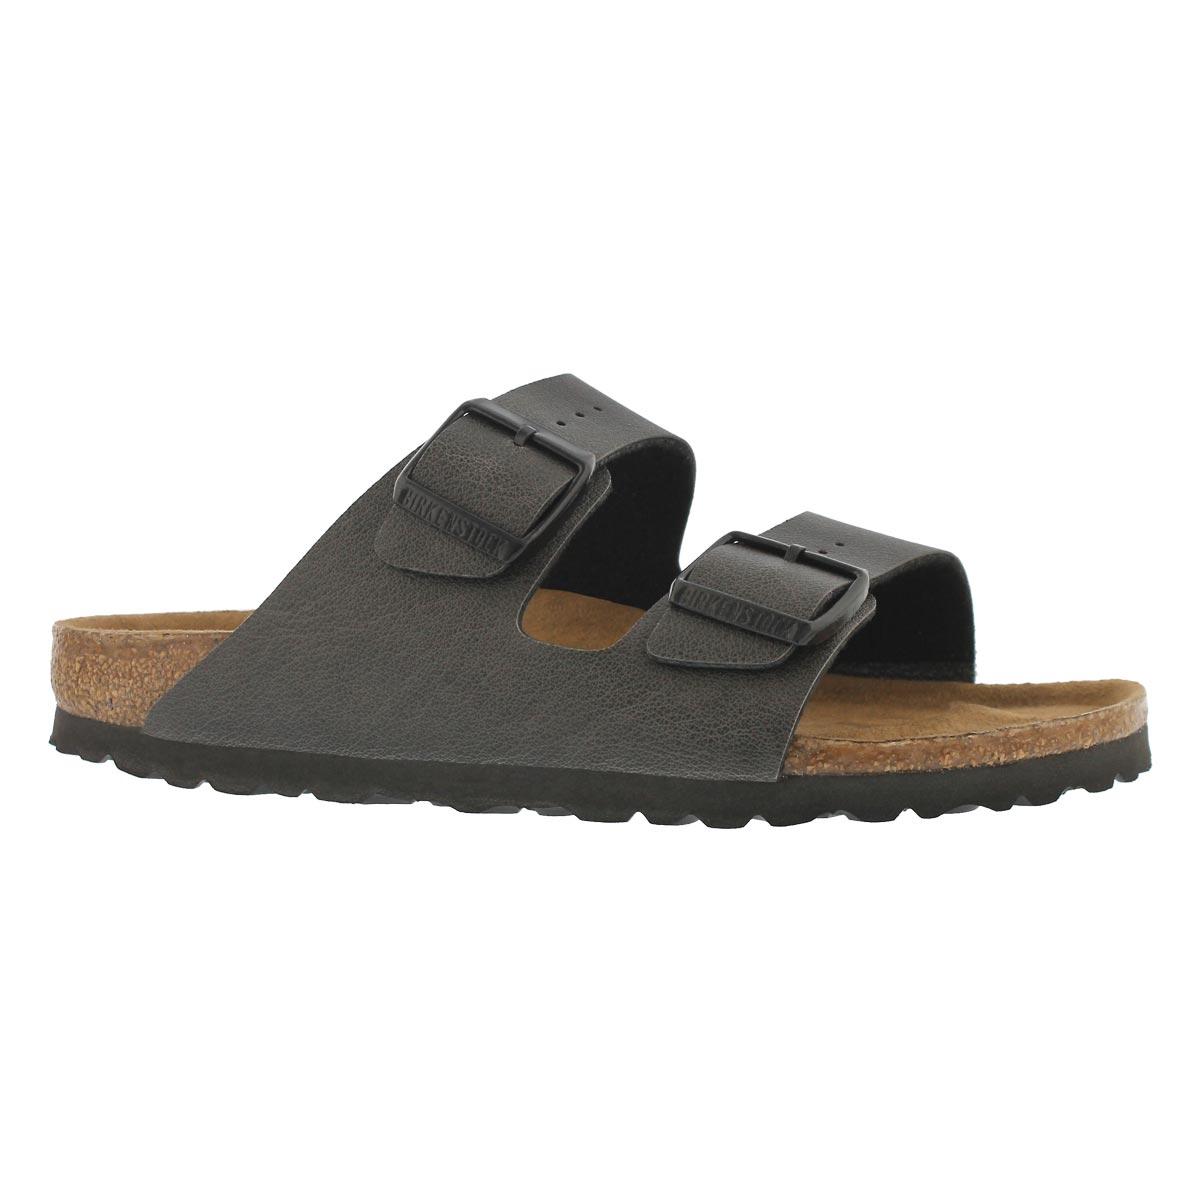 Women's ARIZONA BF anthrcte sandals - Narrow